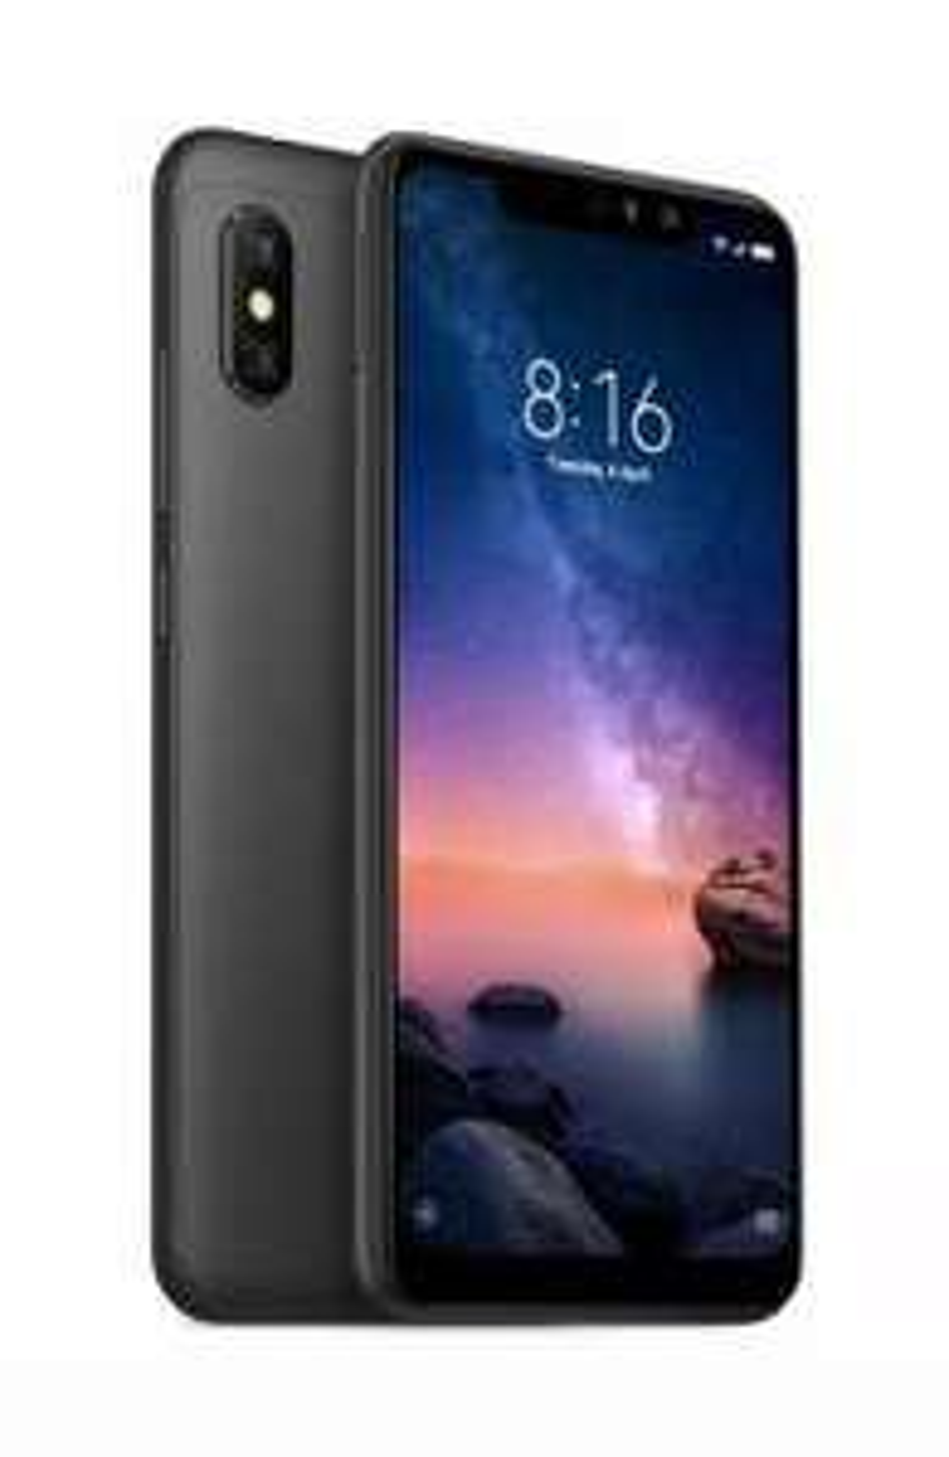 Xiaomi Redmi Note 6 Pro 4GB 64GB Dual Sim Smartphone - Black £131.27 with code @ Ebuyer Express eBay